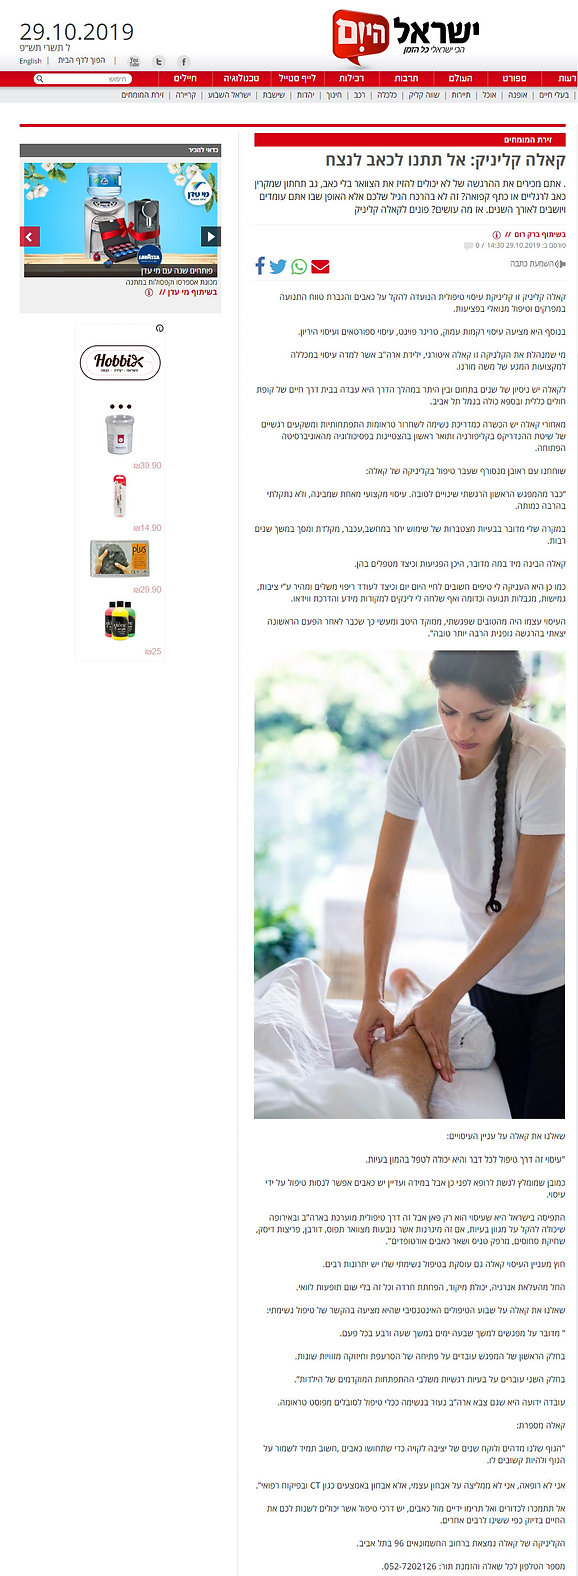 israel-hayom-kala.jpg